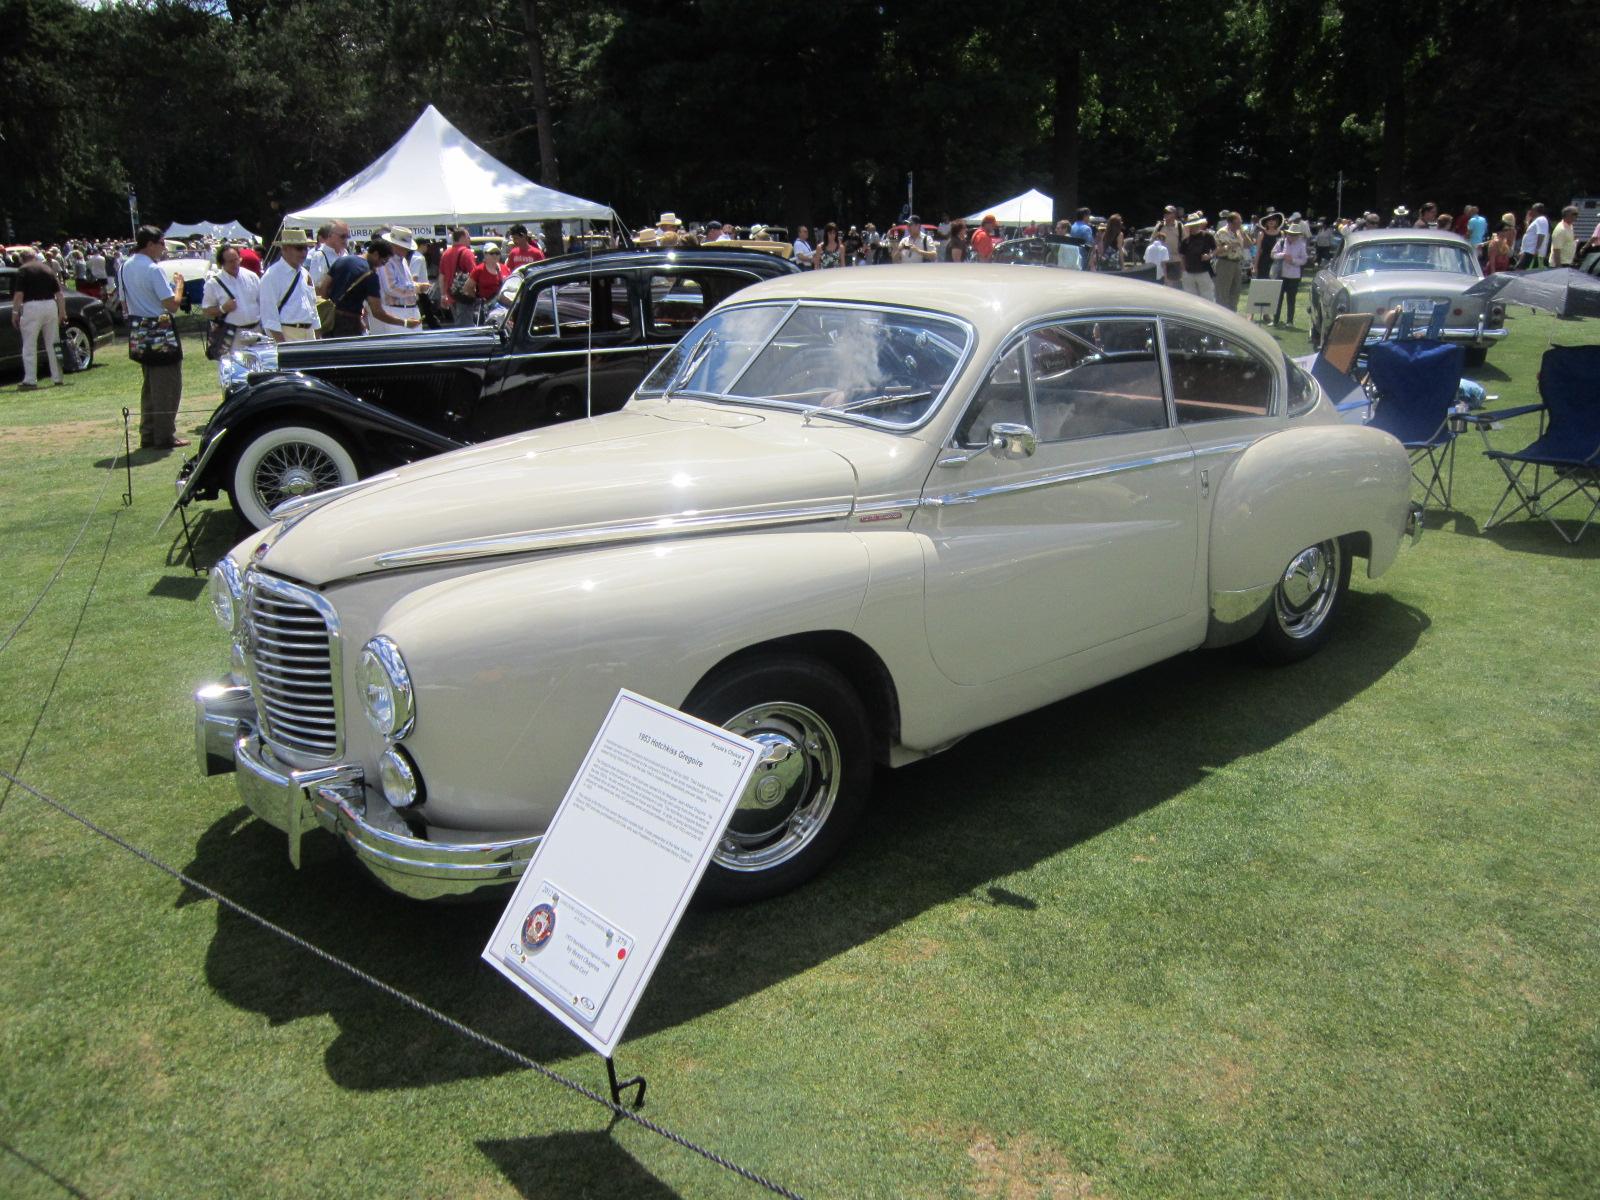 19397 Hotchkiss Coach Decouvrable For Sale Anamera